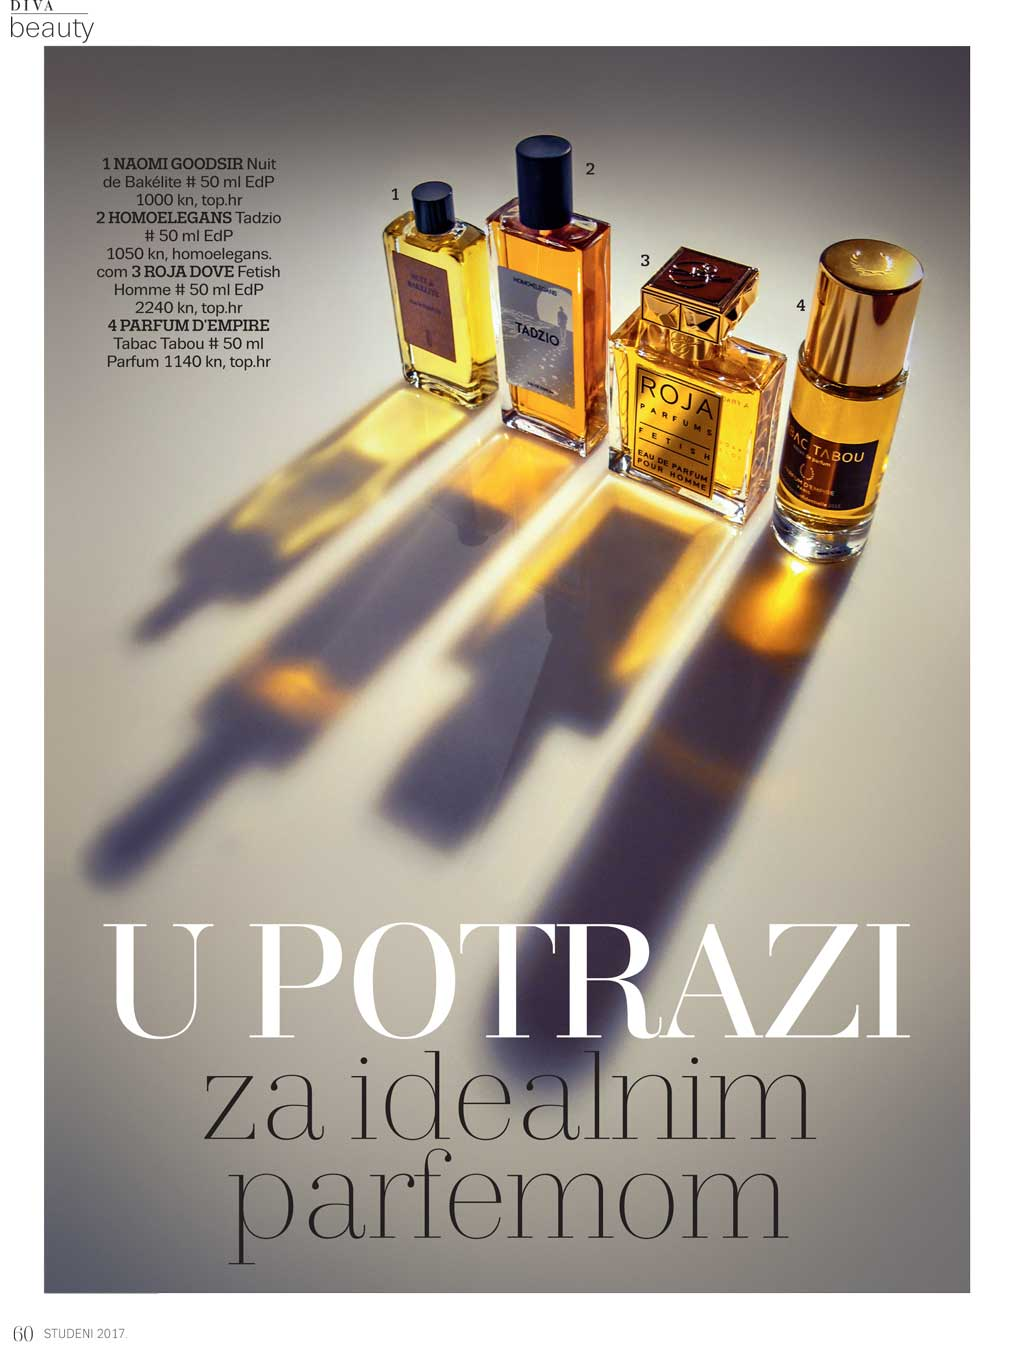 Copy of DIVA MAGAZINE, Croatia